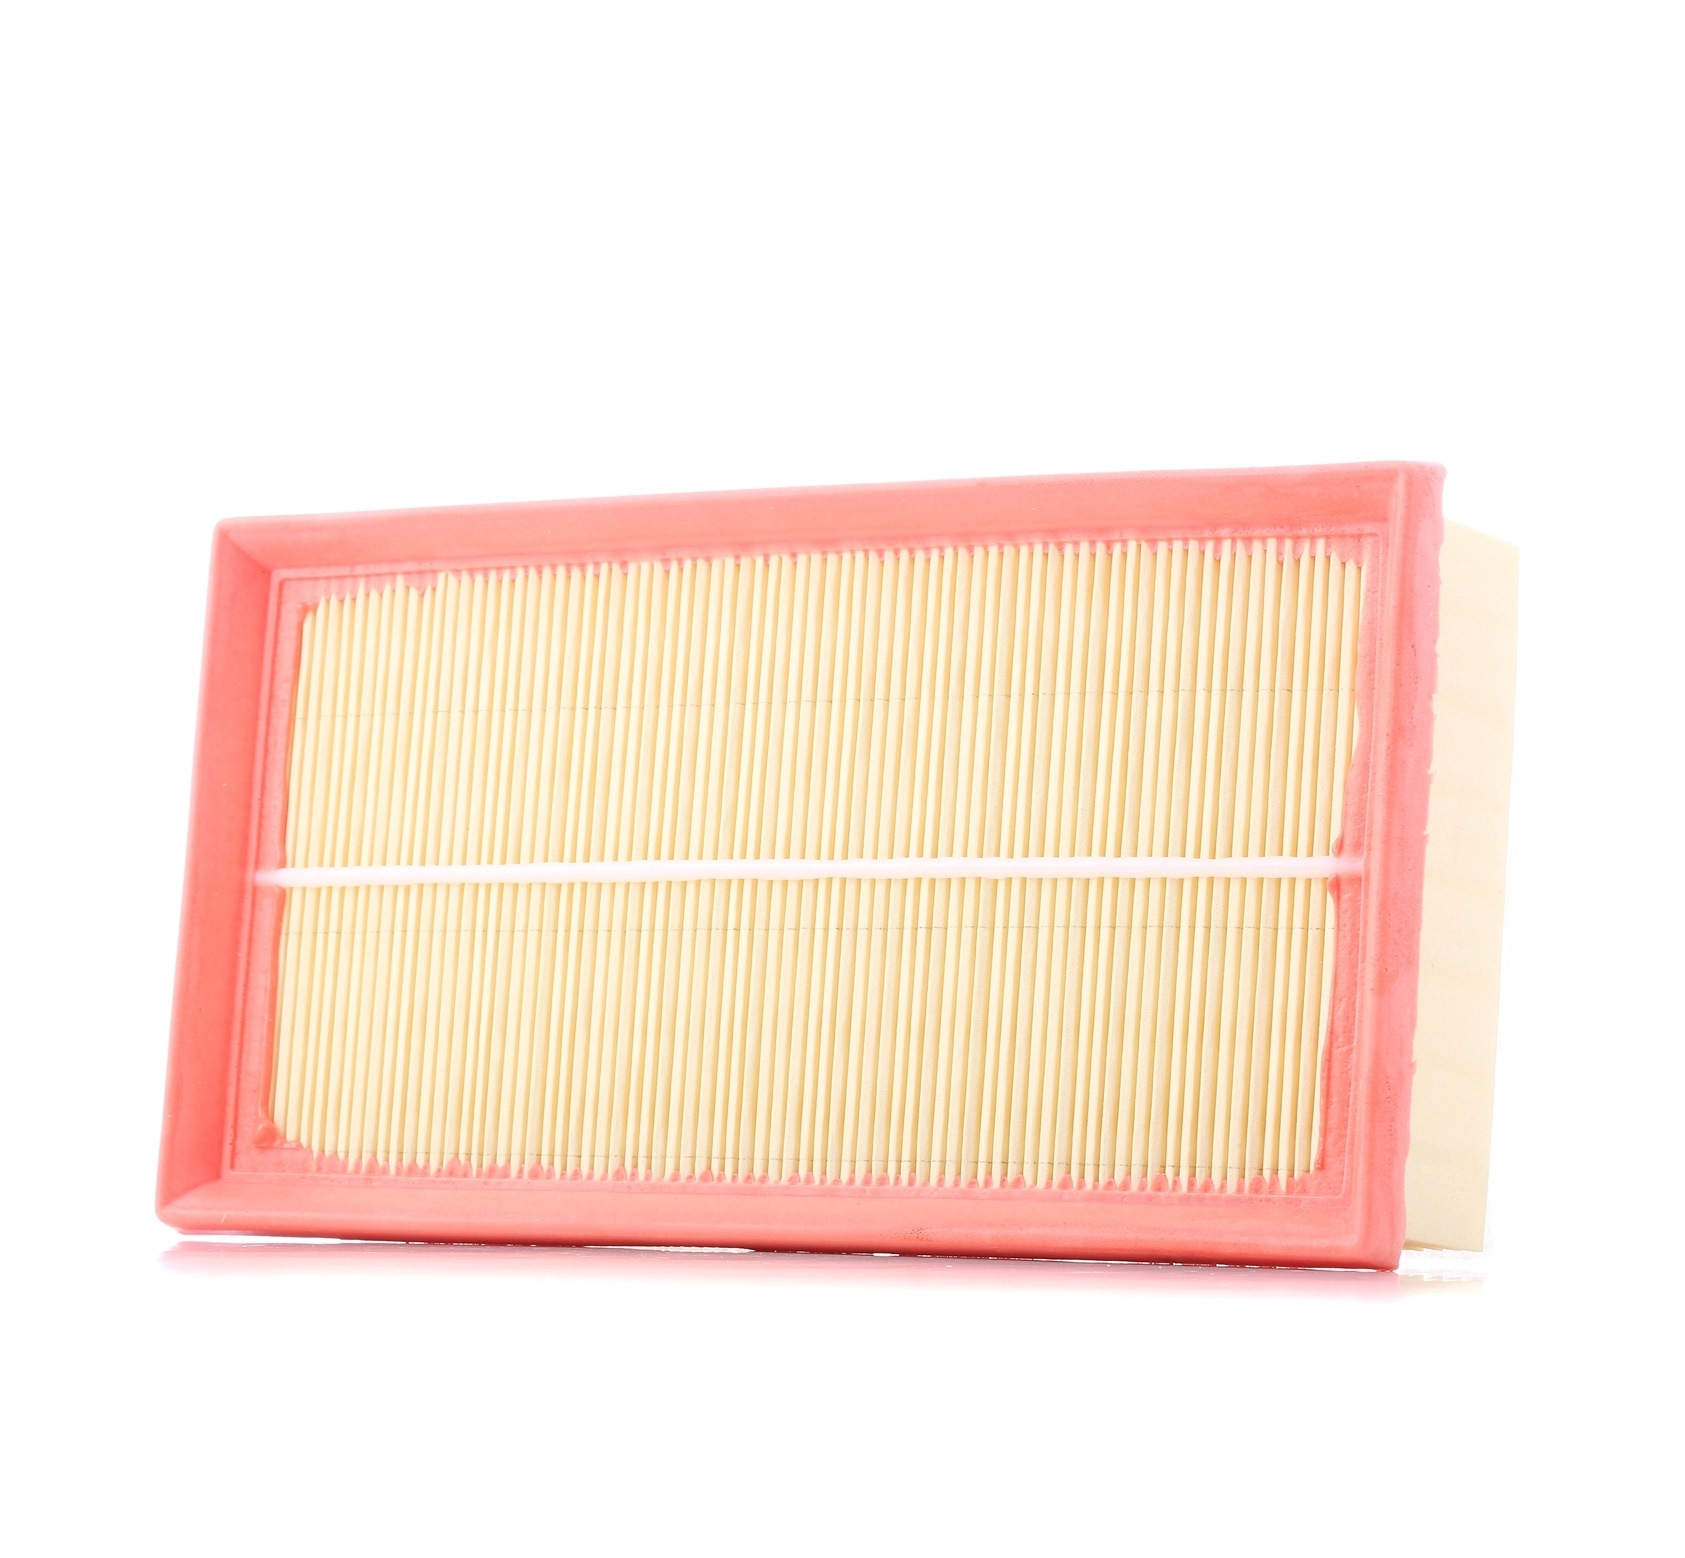 Original Zracni filter 2567-LF-PCS-MS Mini